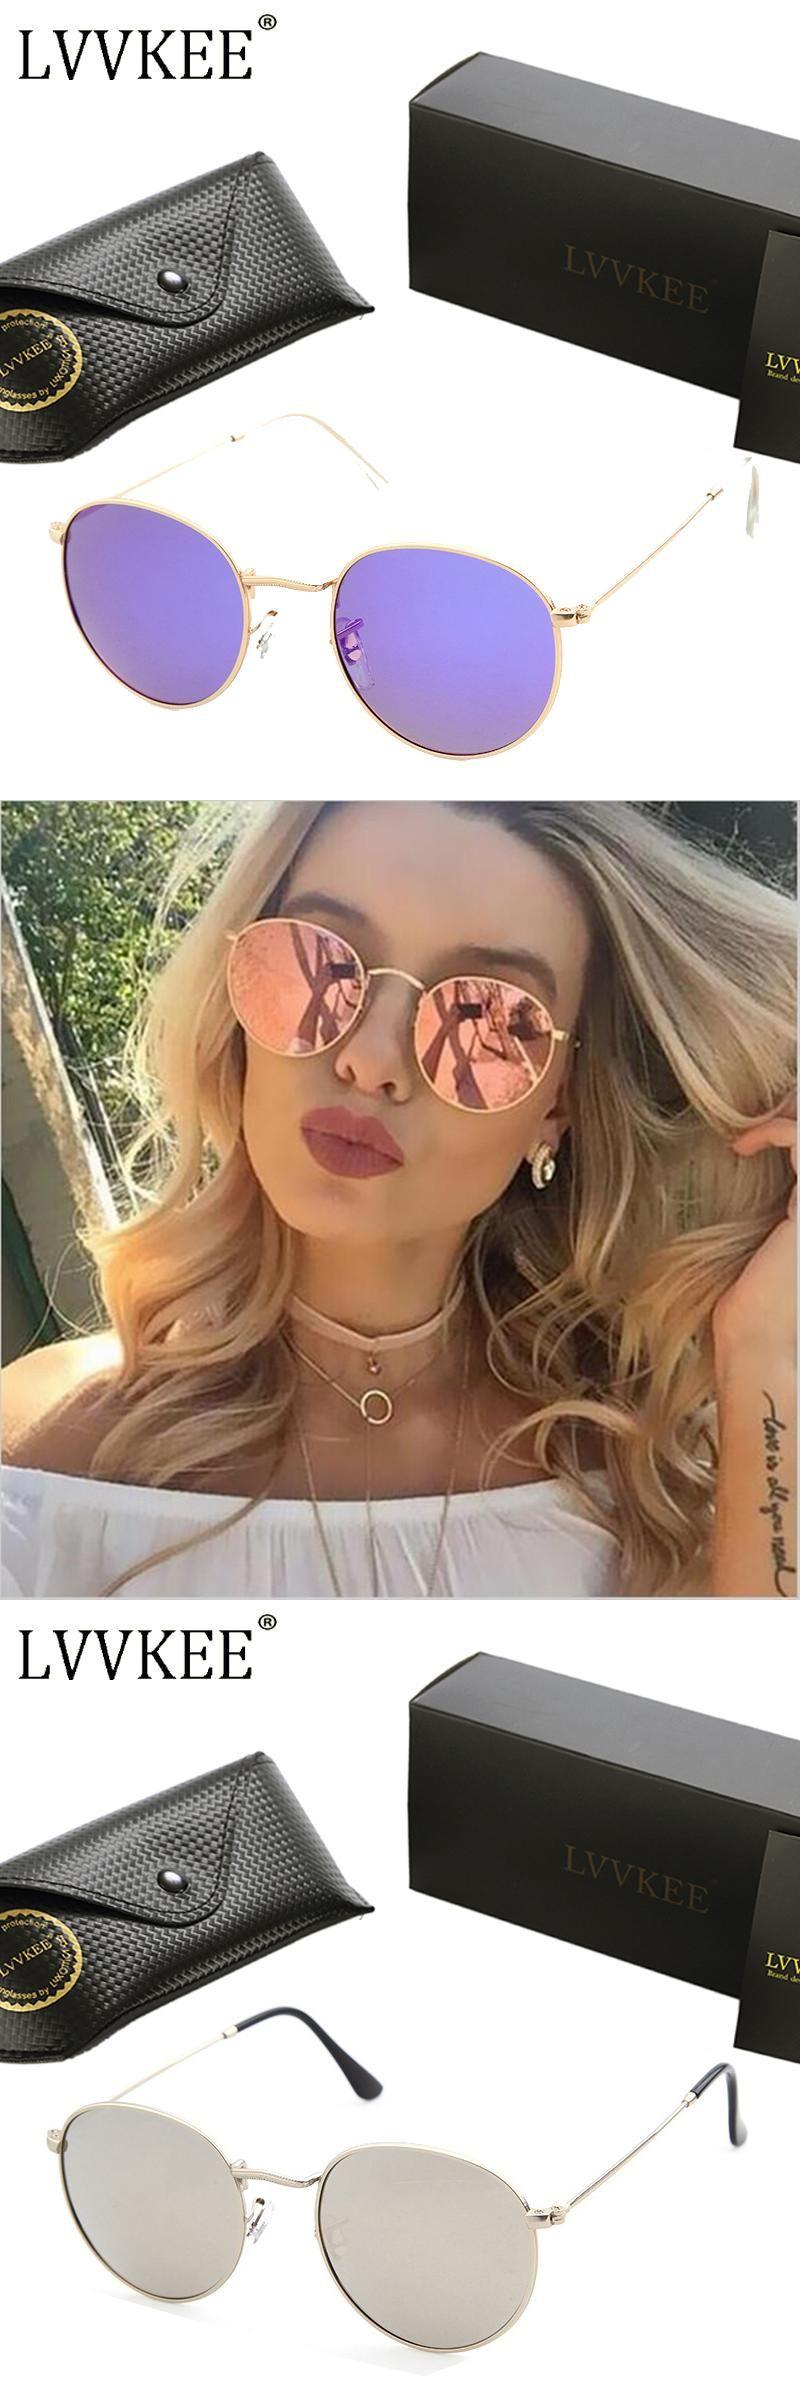 7398d21852 2017 Hot sale Classic brand Female Round Polarized Sunglasses for Small Face  Sun glasses Women men